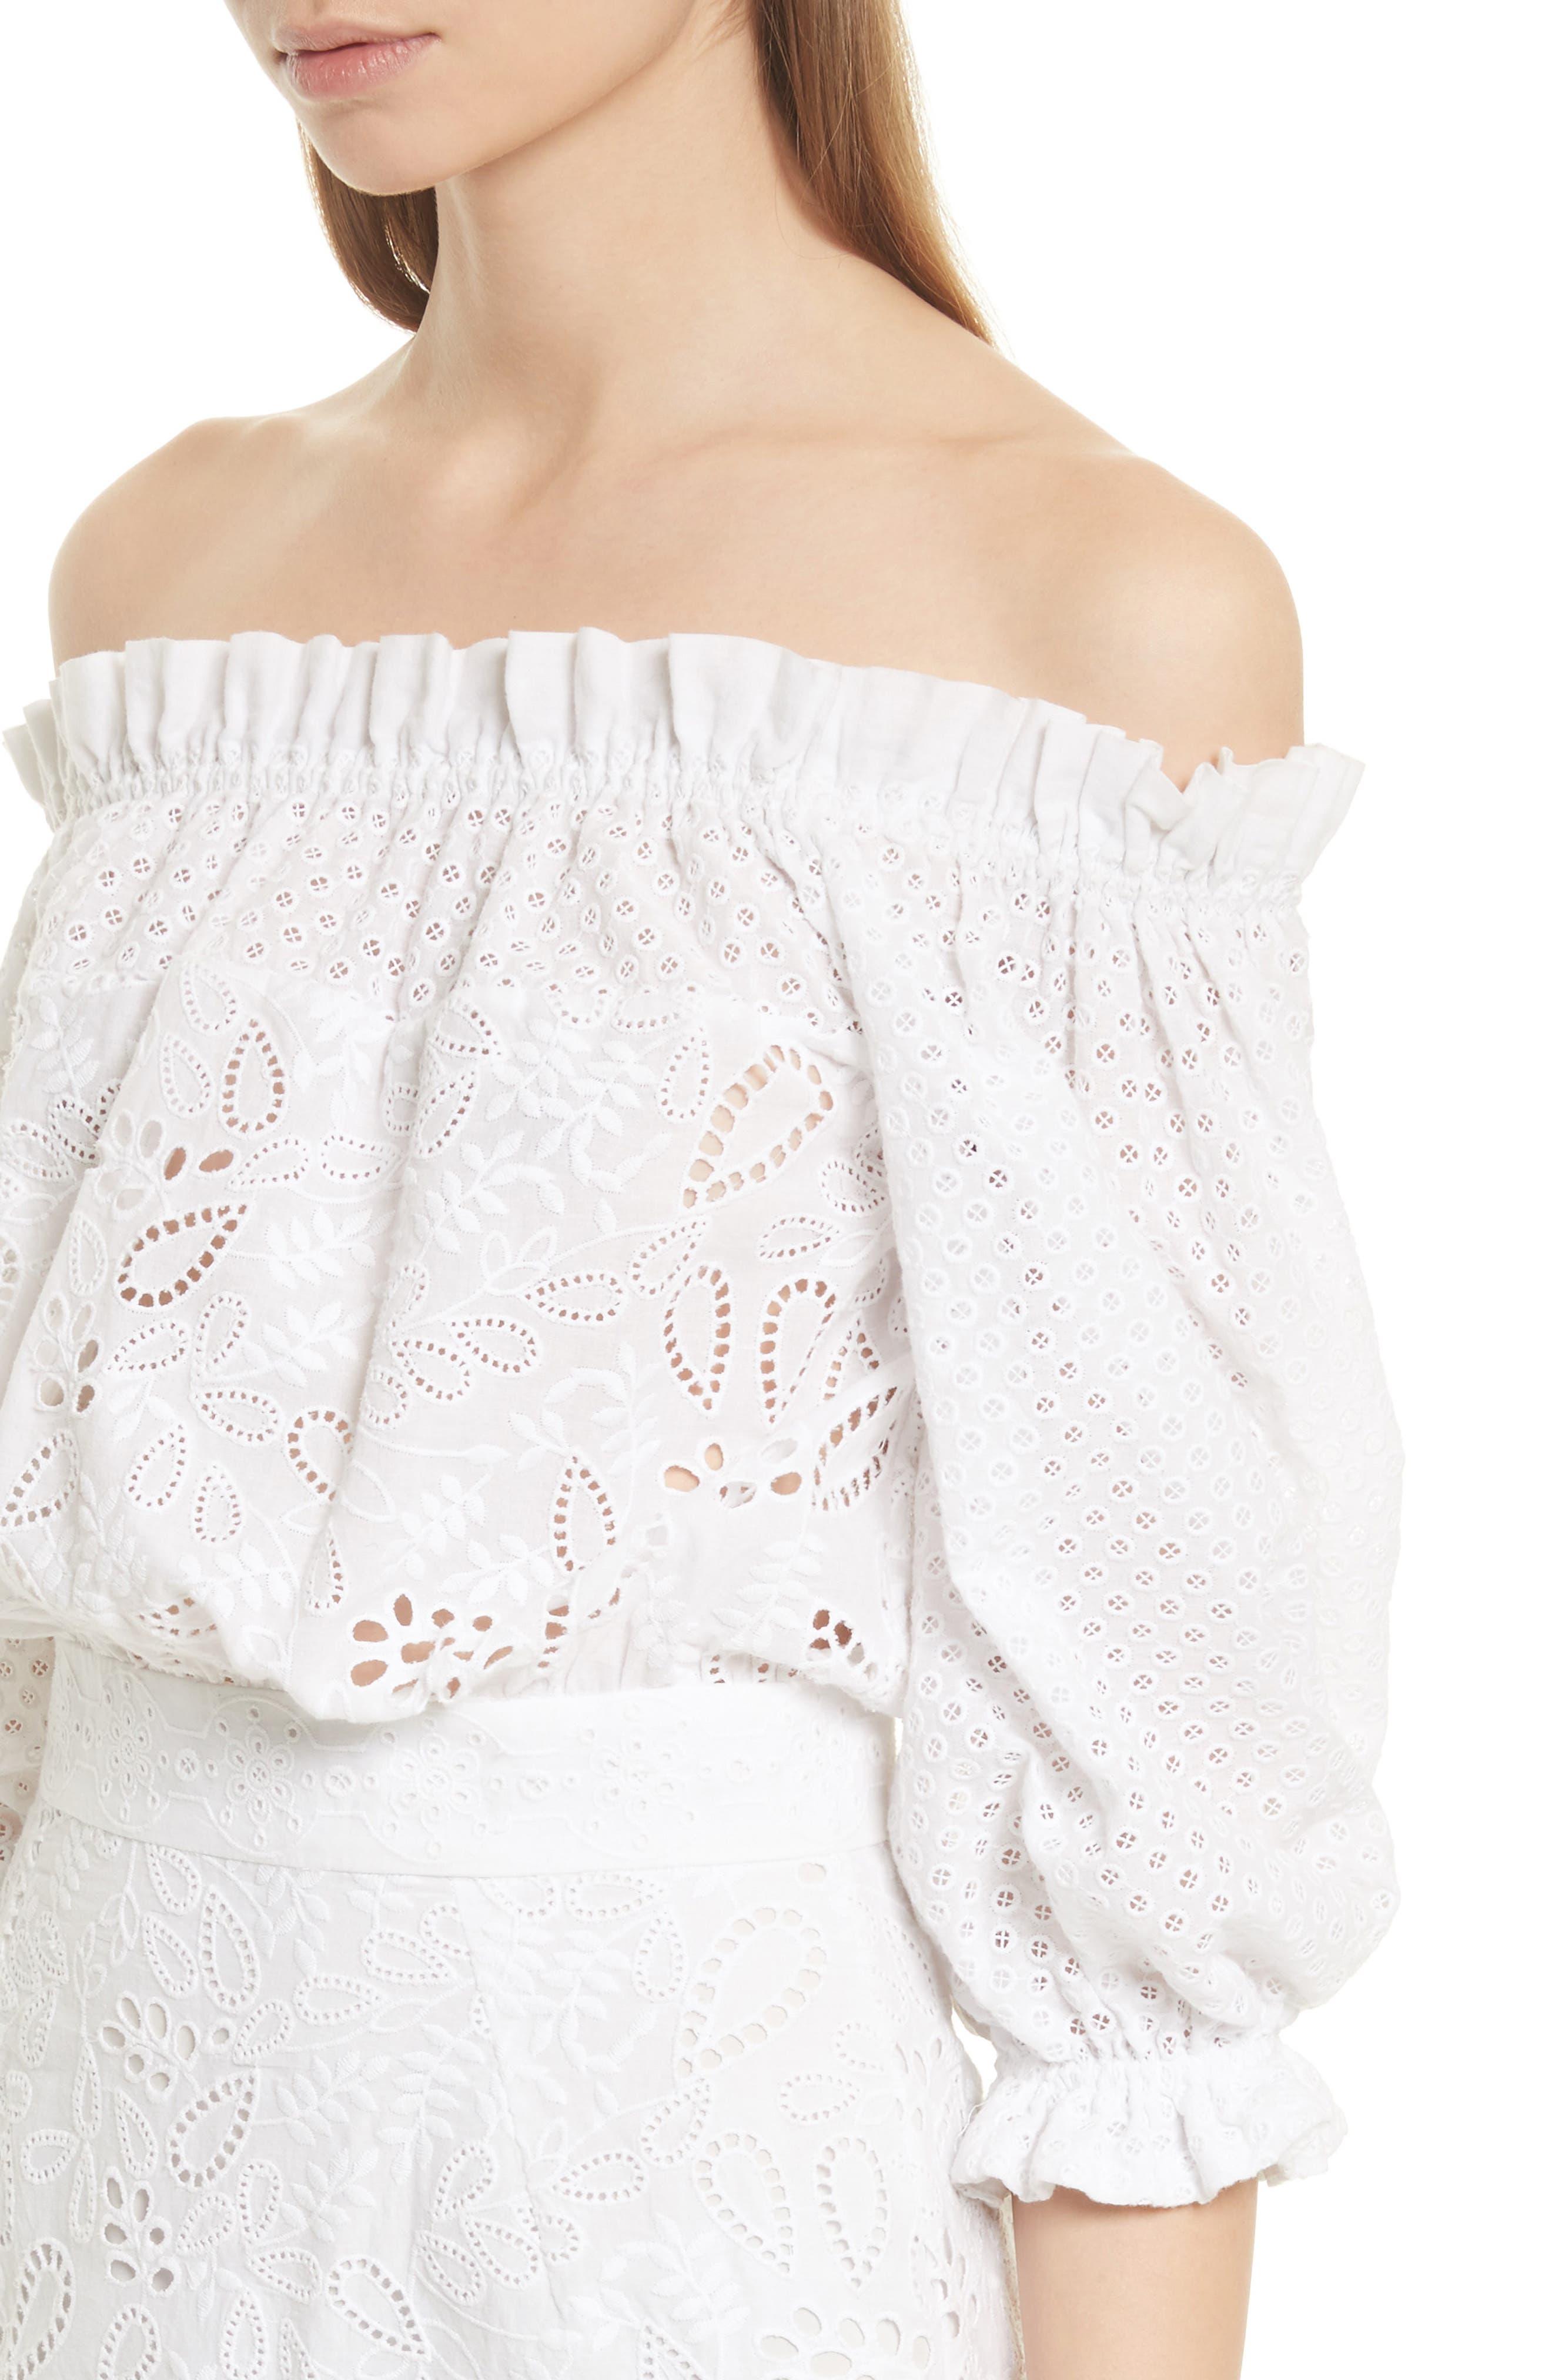 Grace Cotton Off the Shoulder Dress,                             Alternate thumbnail 4, color,                             White/ French Lace